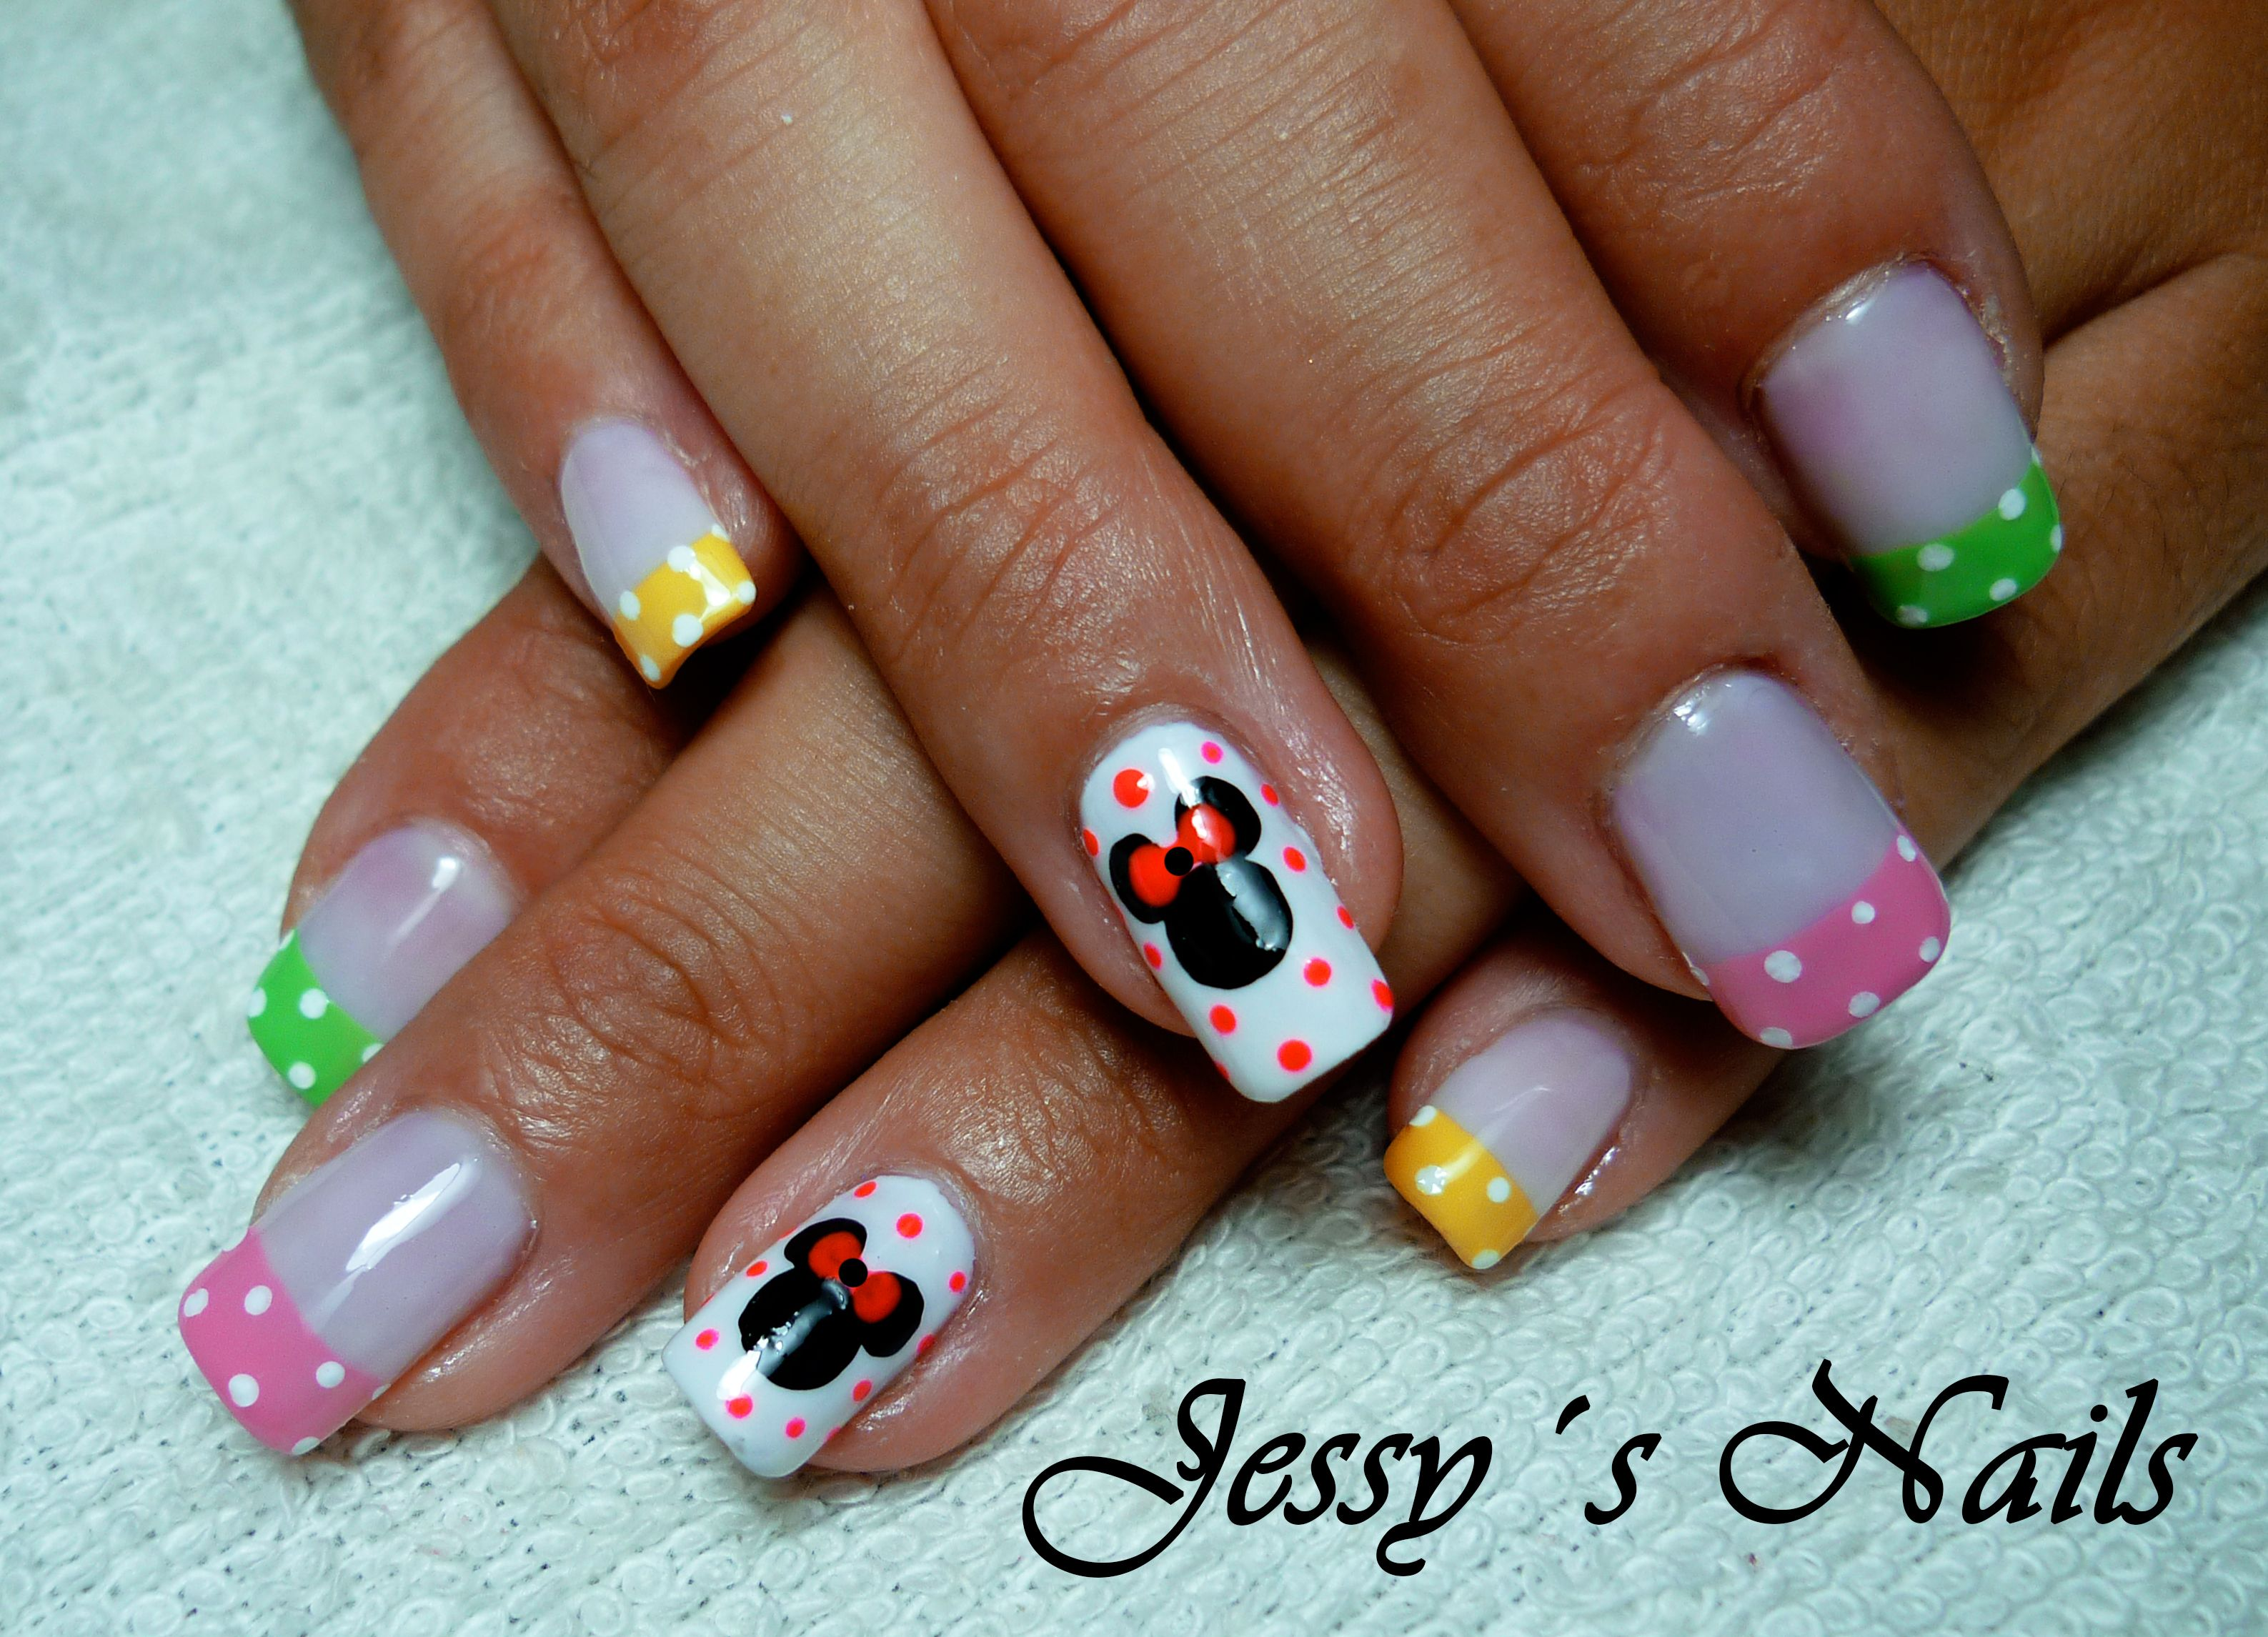 uñas de minnie mouse #nail art   UÑAS CON LUNARES O PUNTOS ...